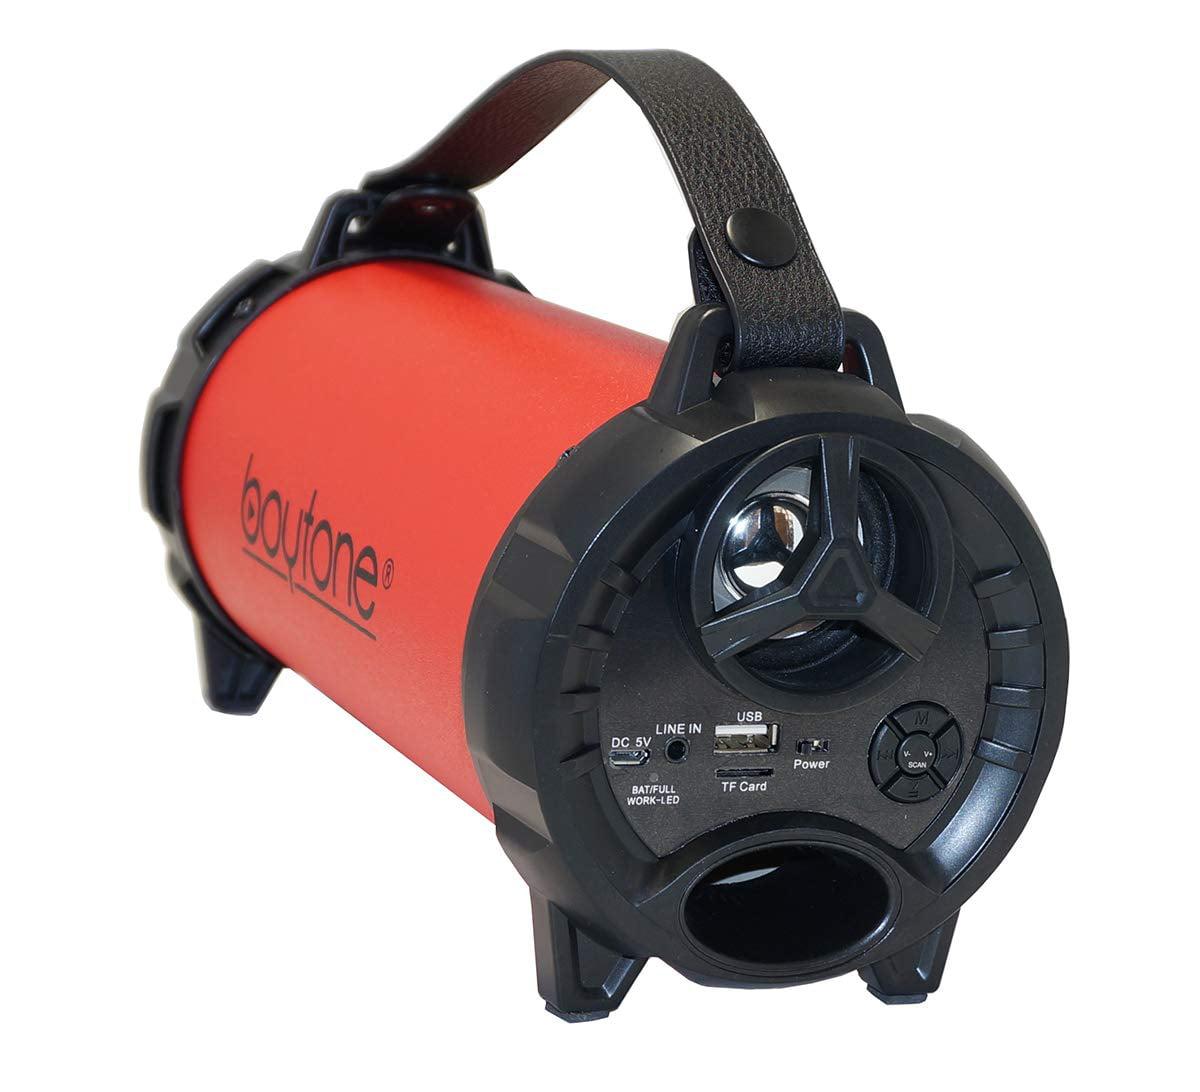 Boytone BT-40RD Portable Bluetooth Indoor/Outdoor Speaker - Red